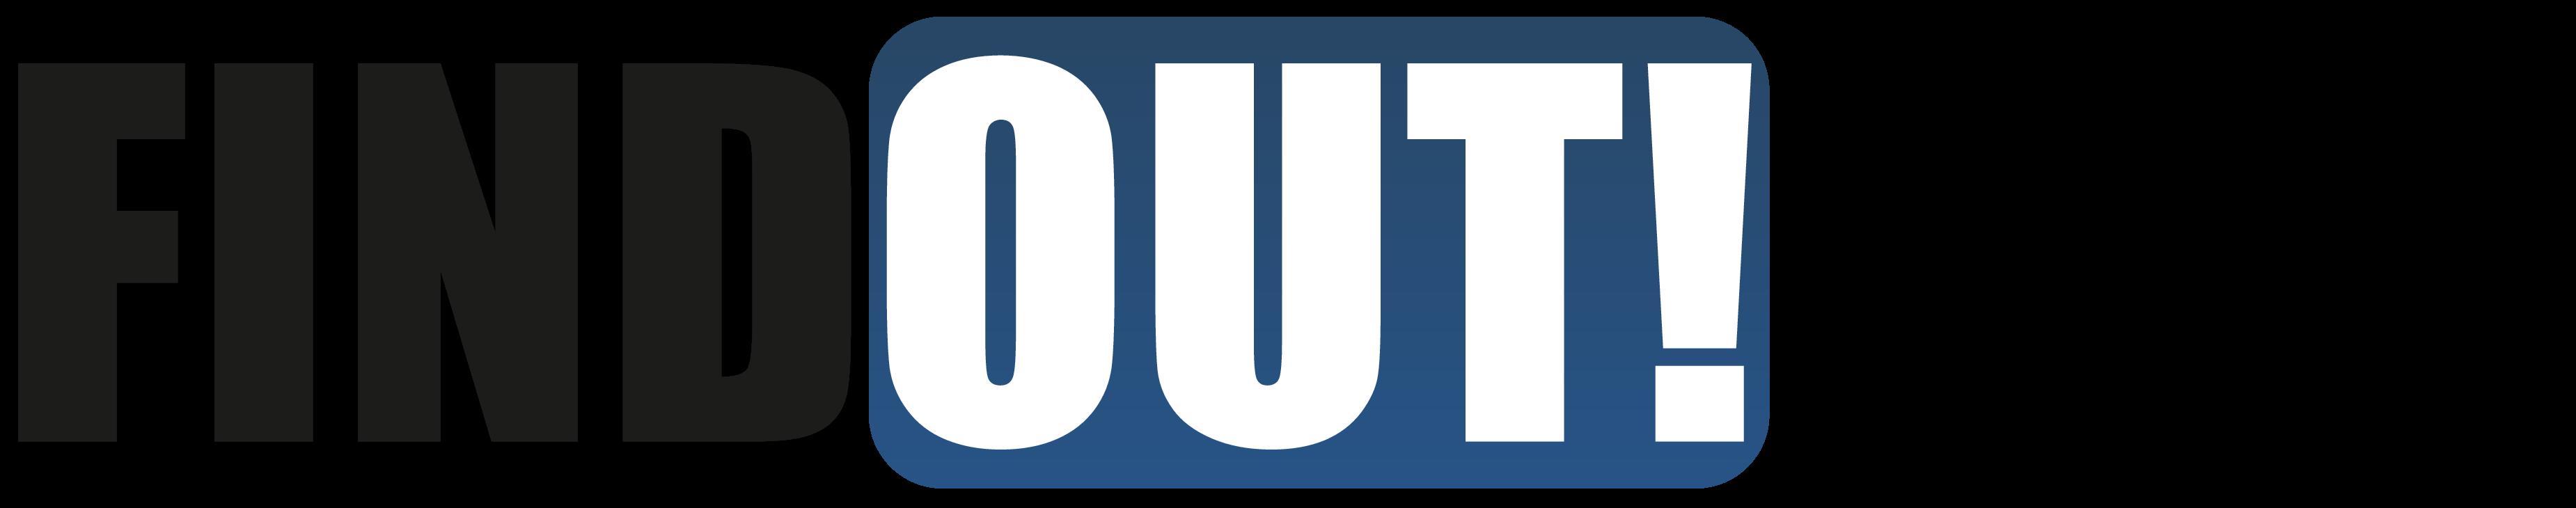 Findout Media